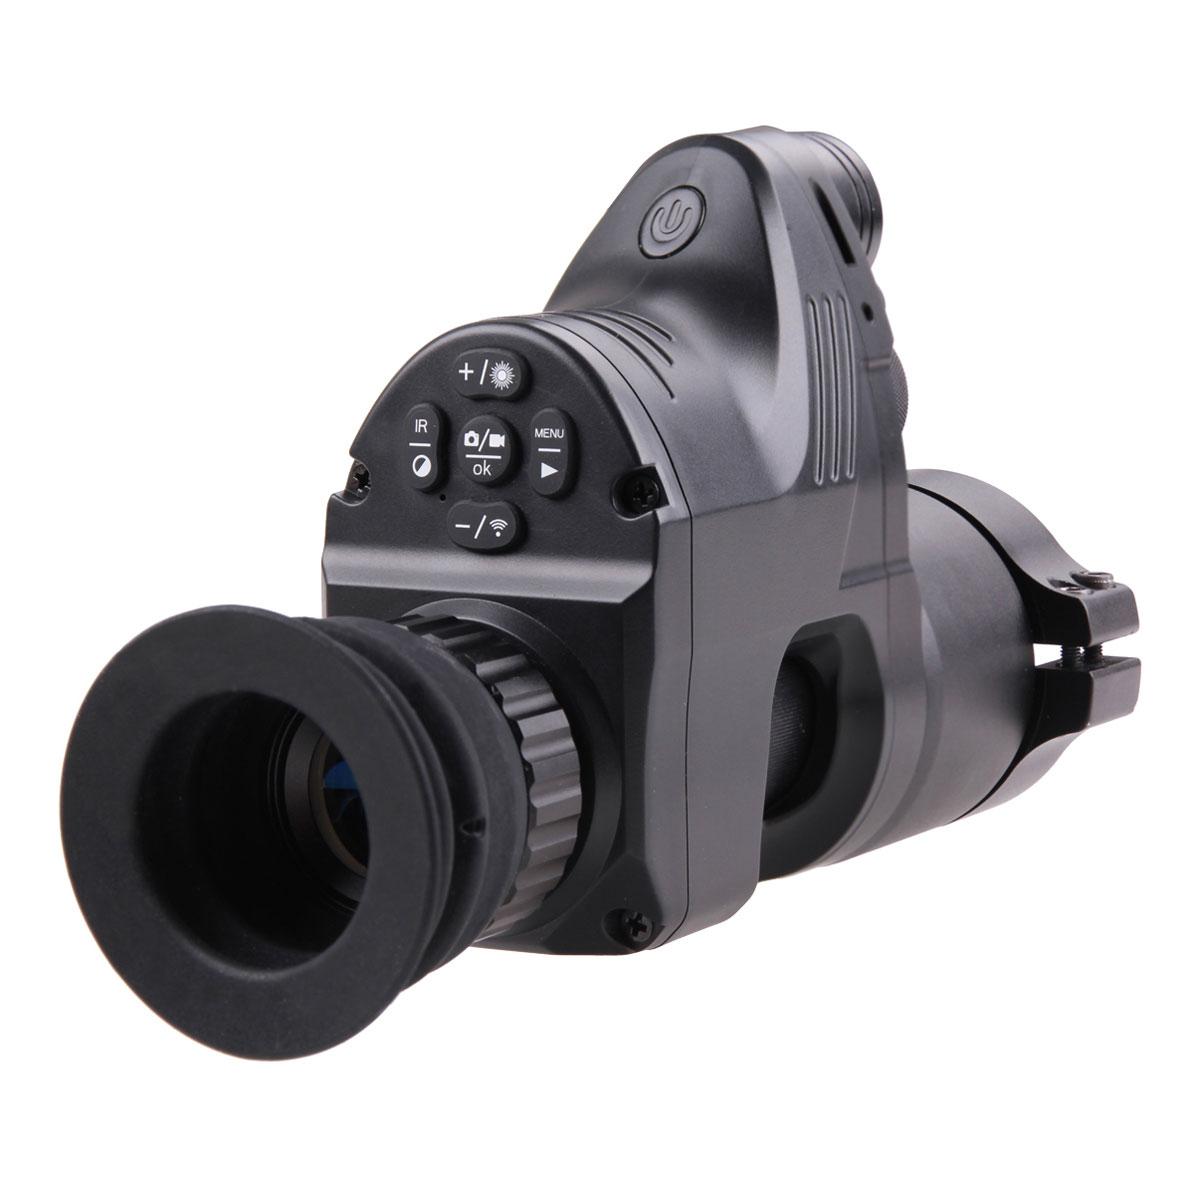 PARD 普雷德 NV007 红外夜视套瞄 瞄准镜后置夜视